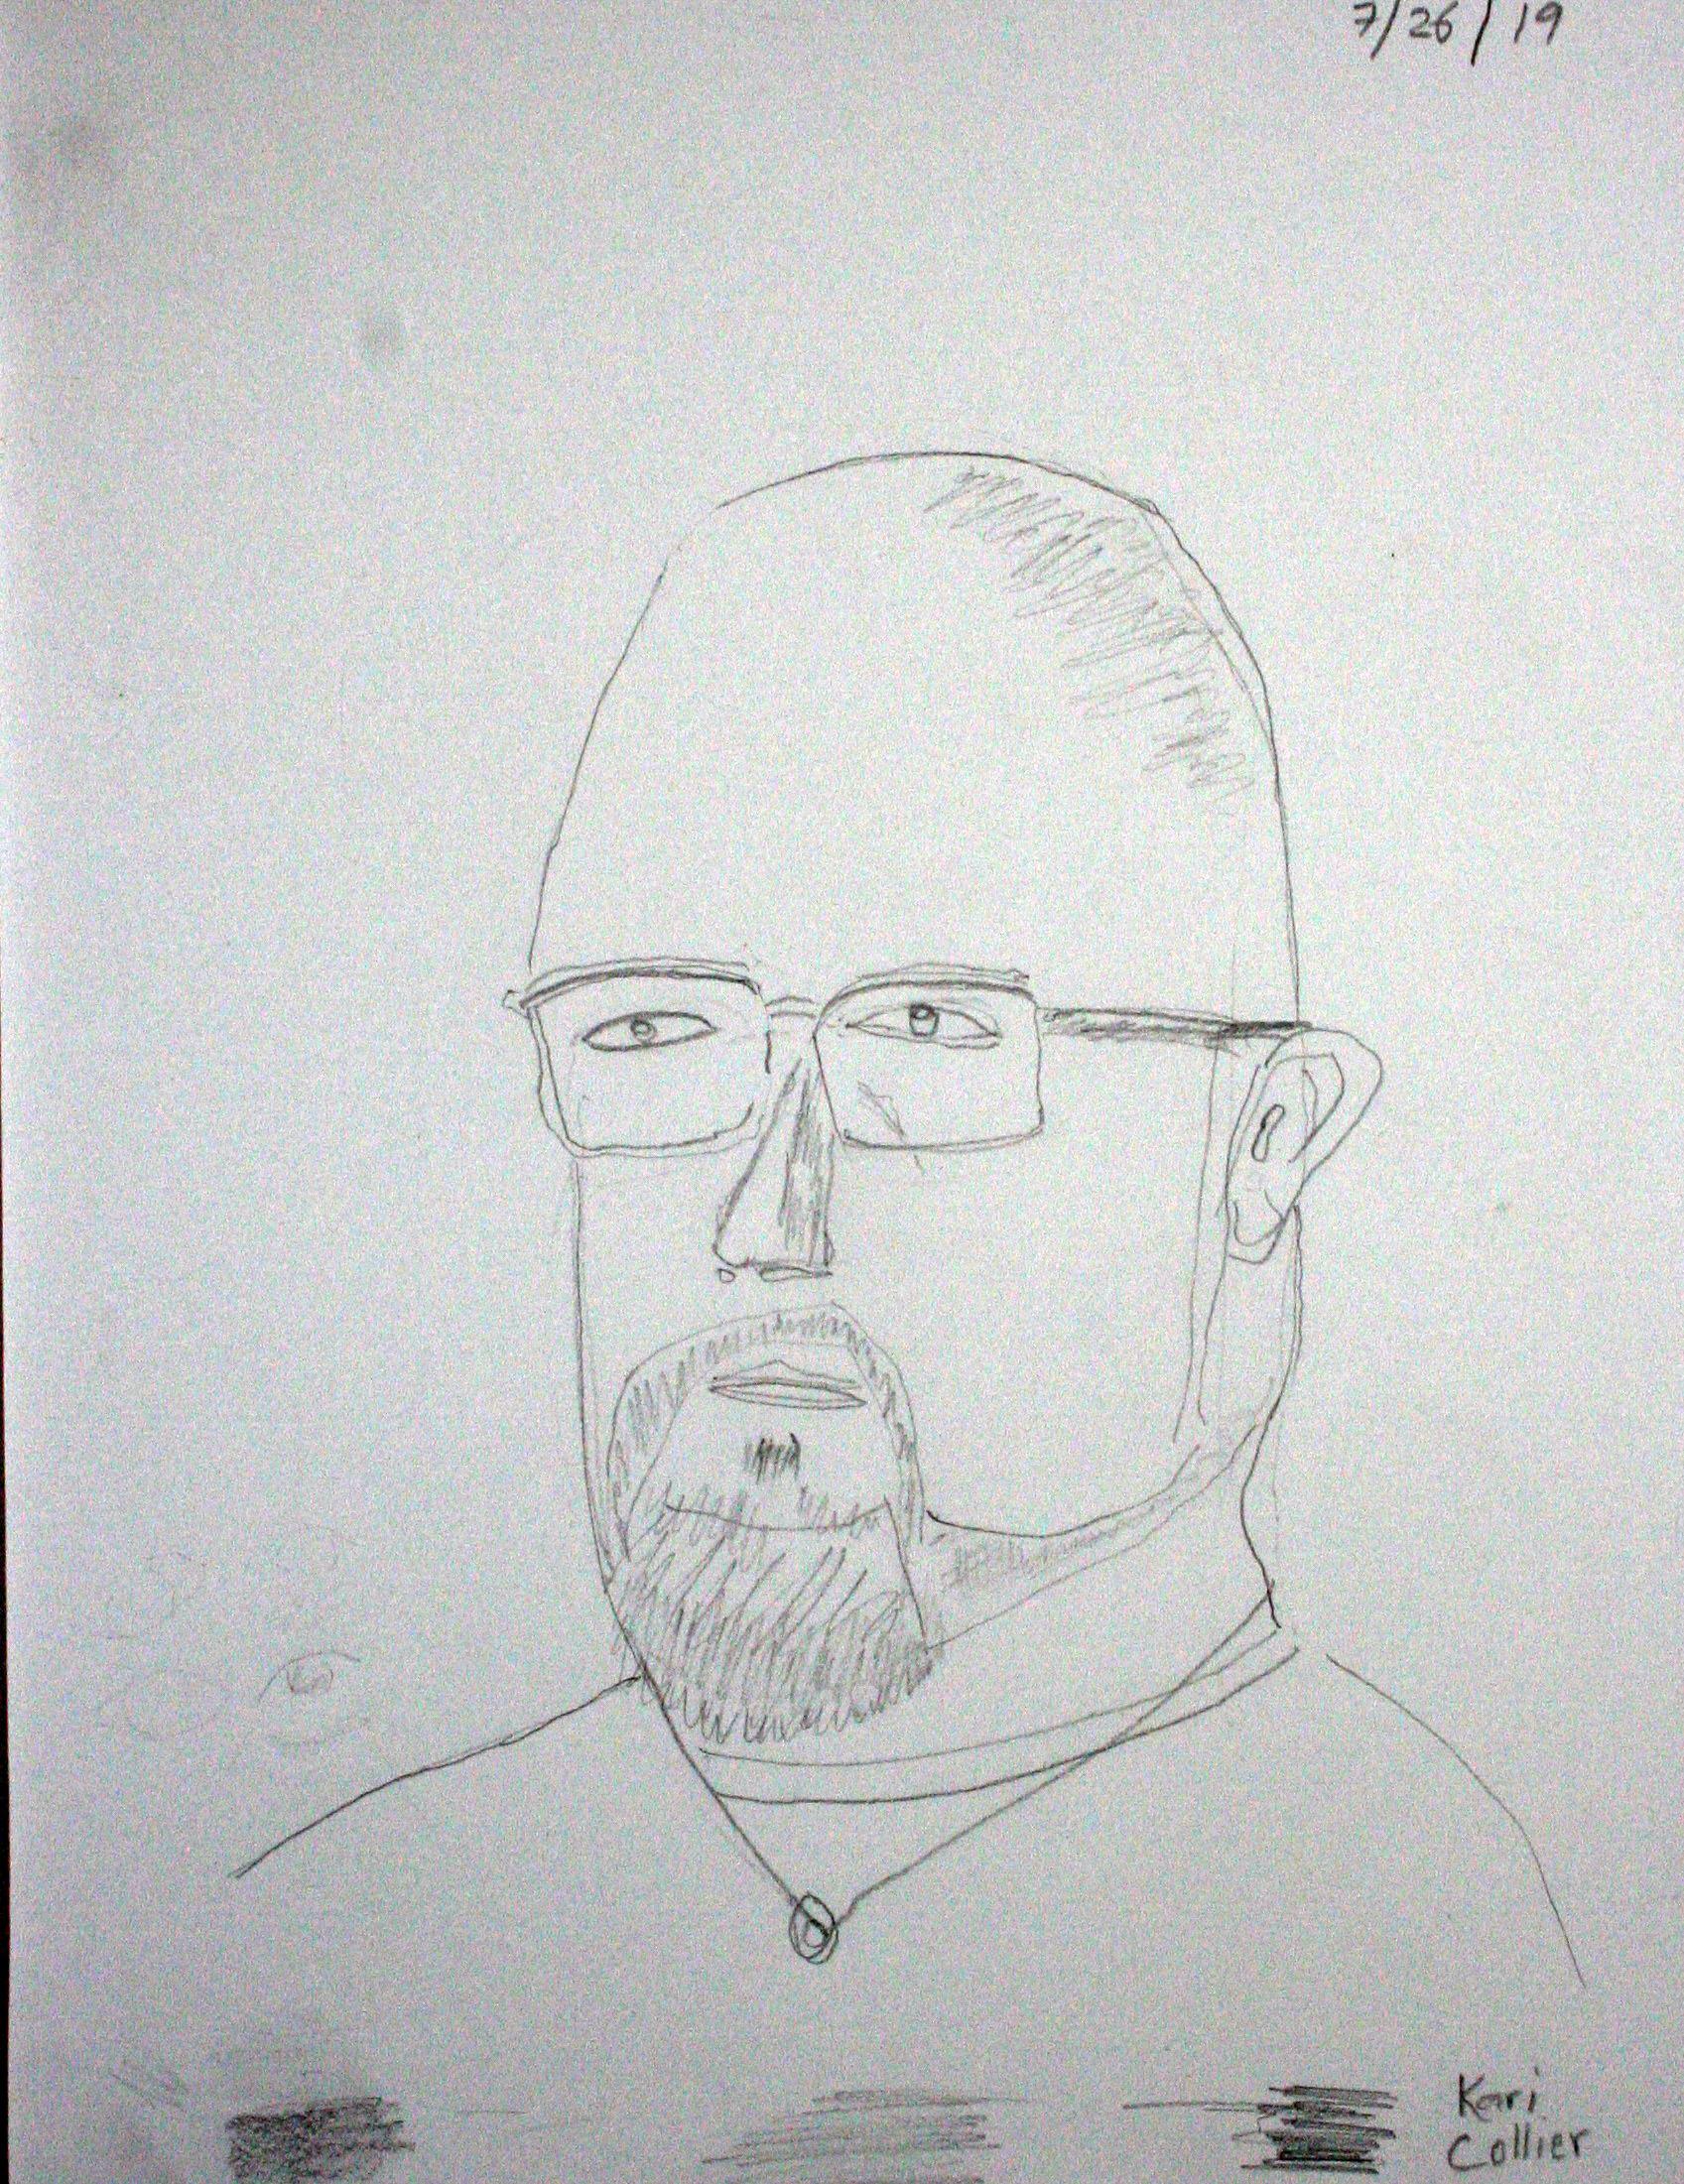 Kari Collier - Pencil